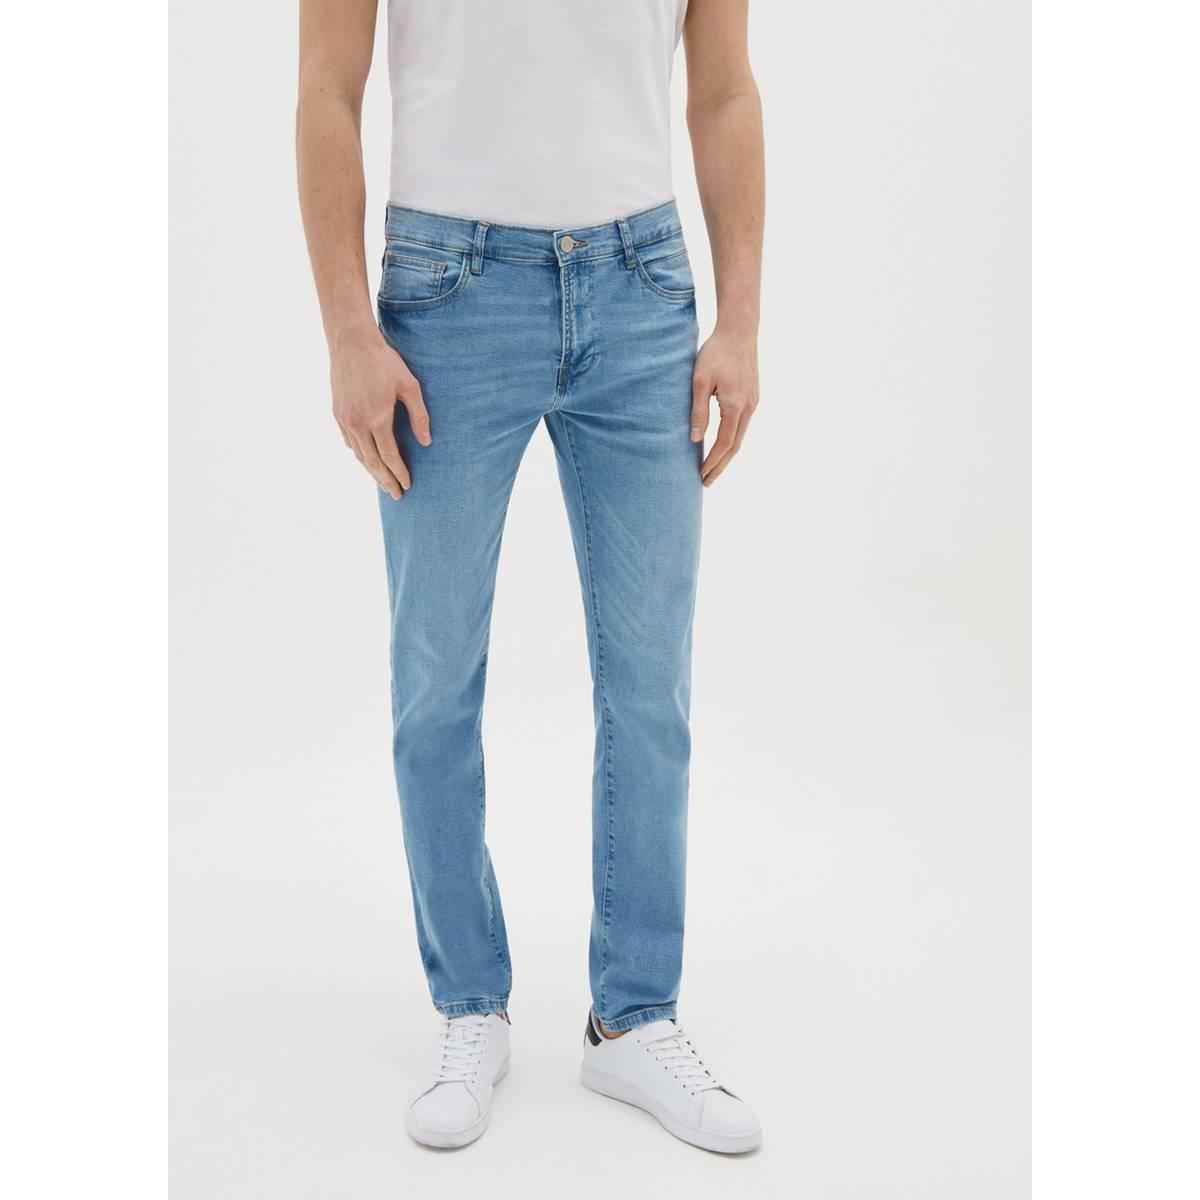 Republic of Denim Slim Fit Jeans for Men